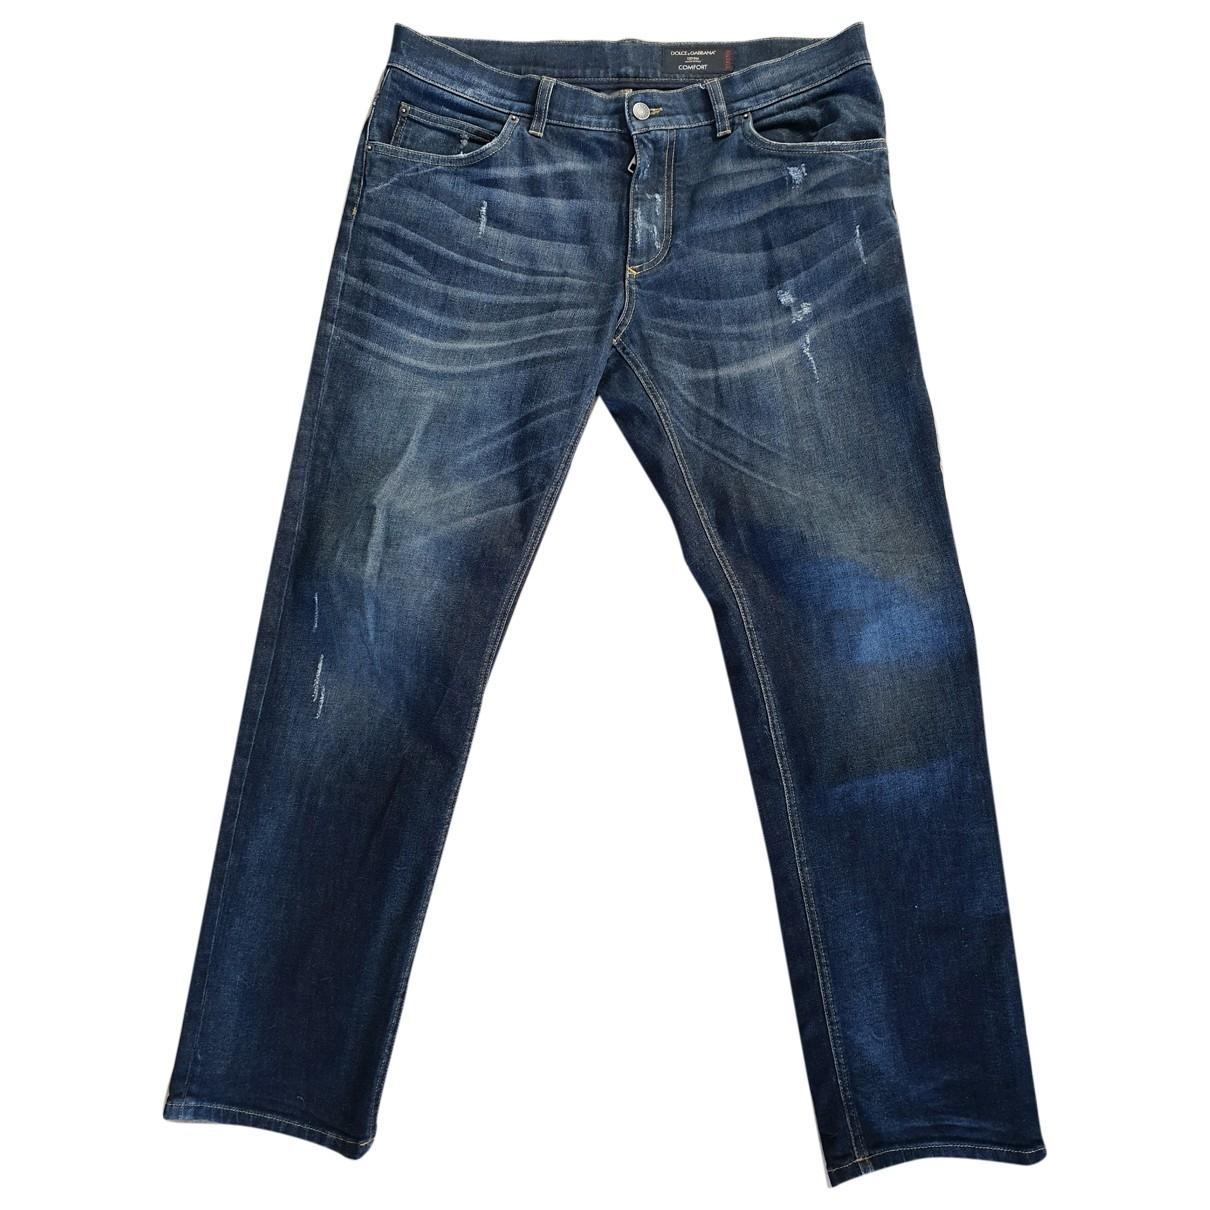 Dolce & Gabbana \N Blue Cotton Jeans for Men 34 US